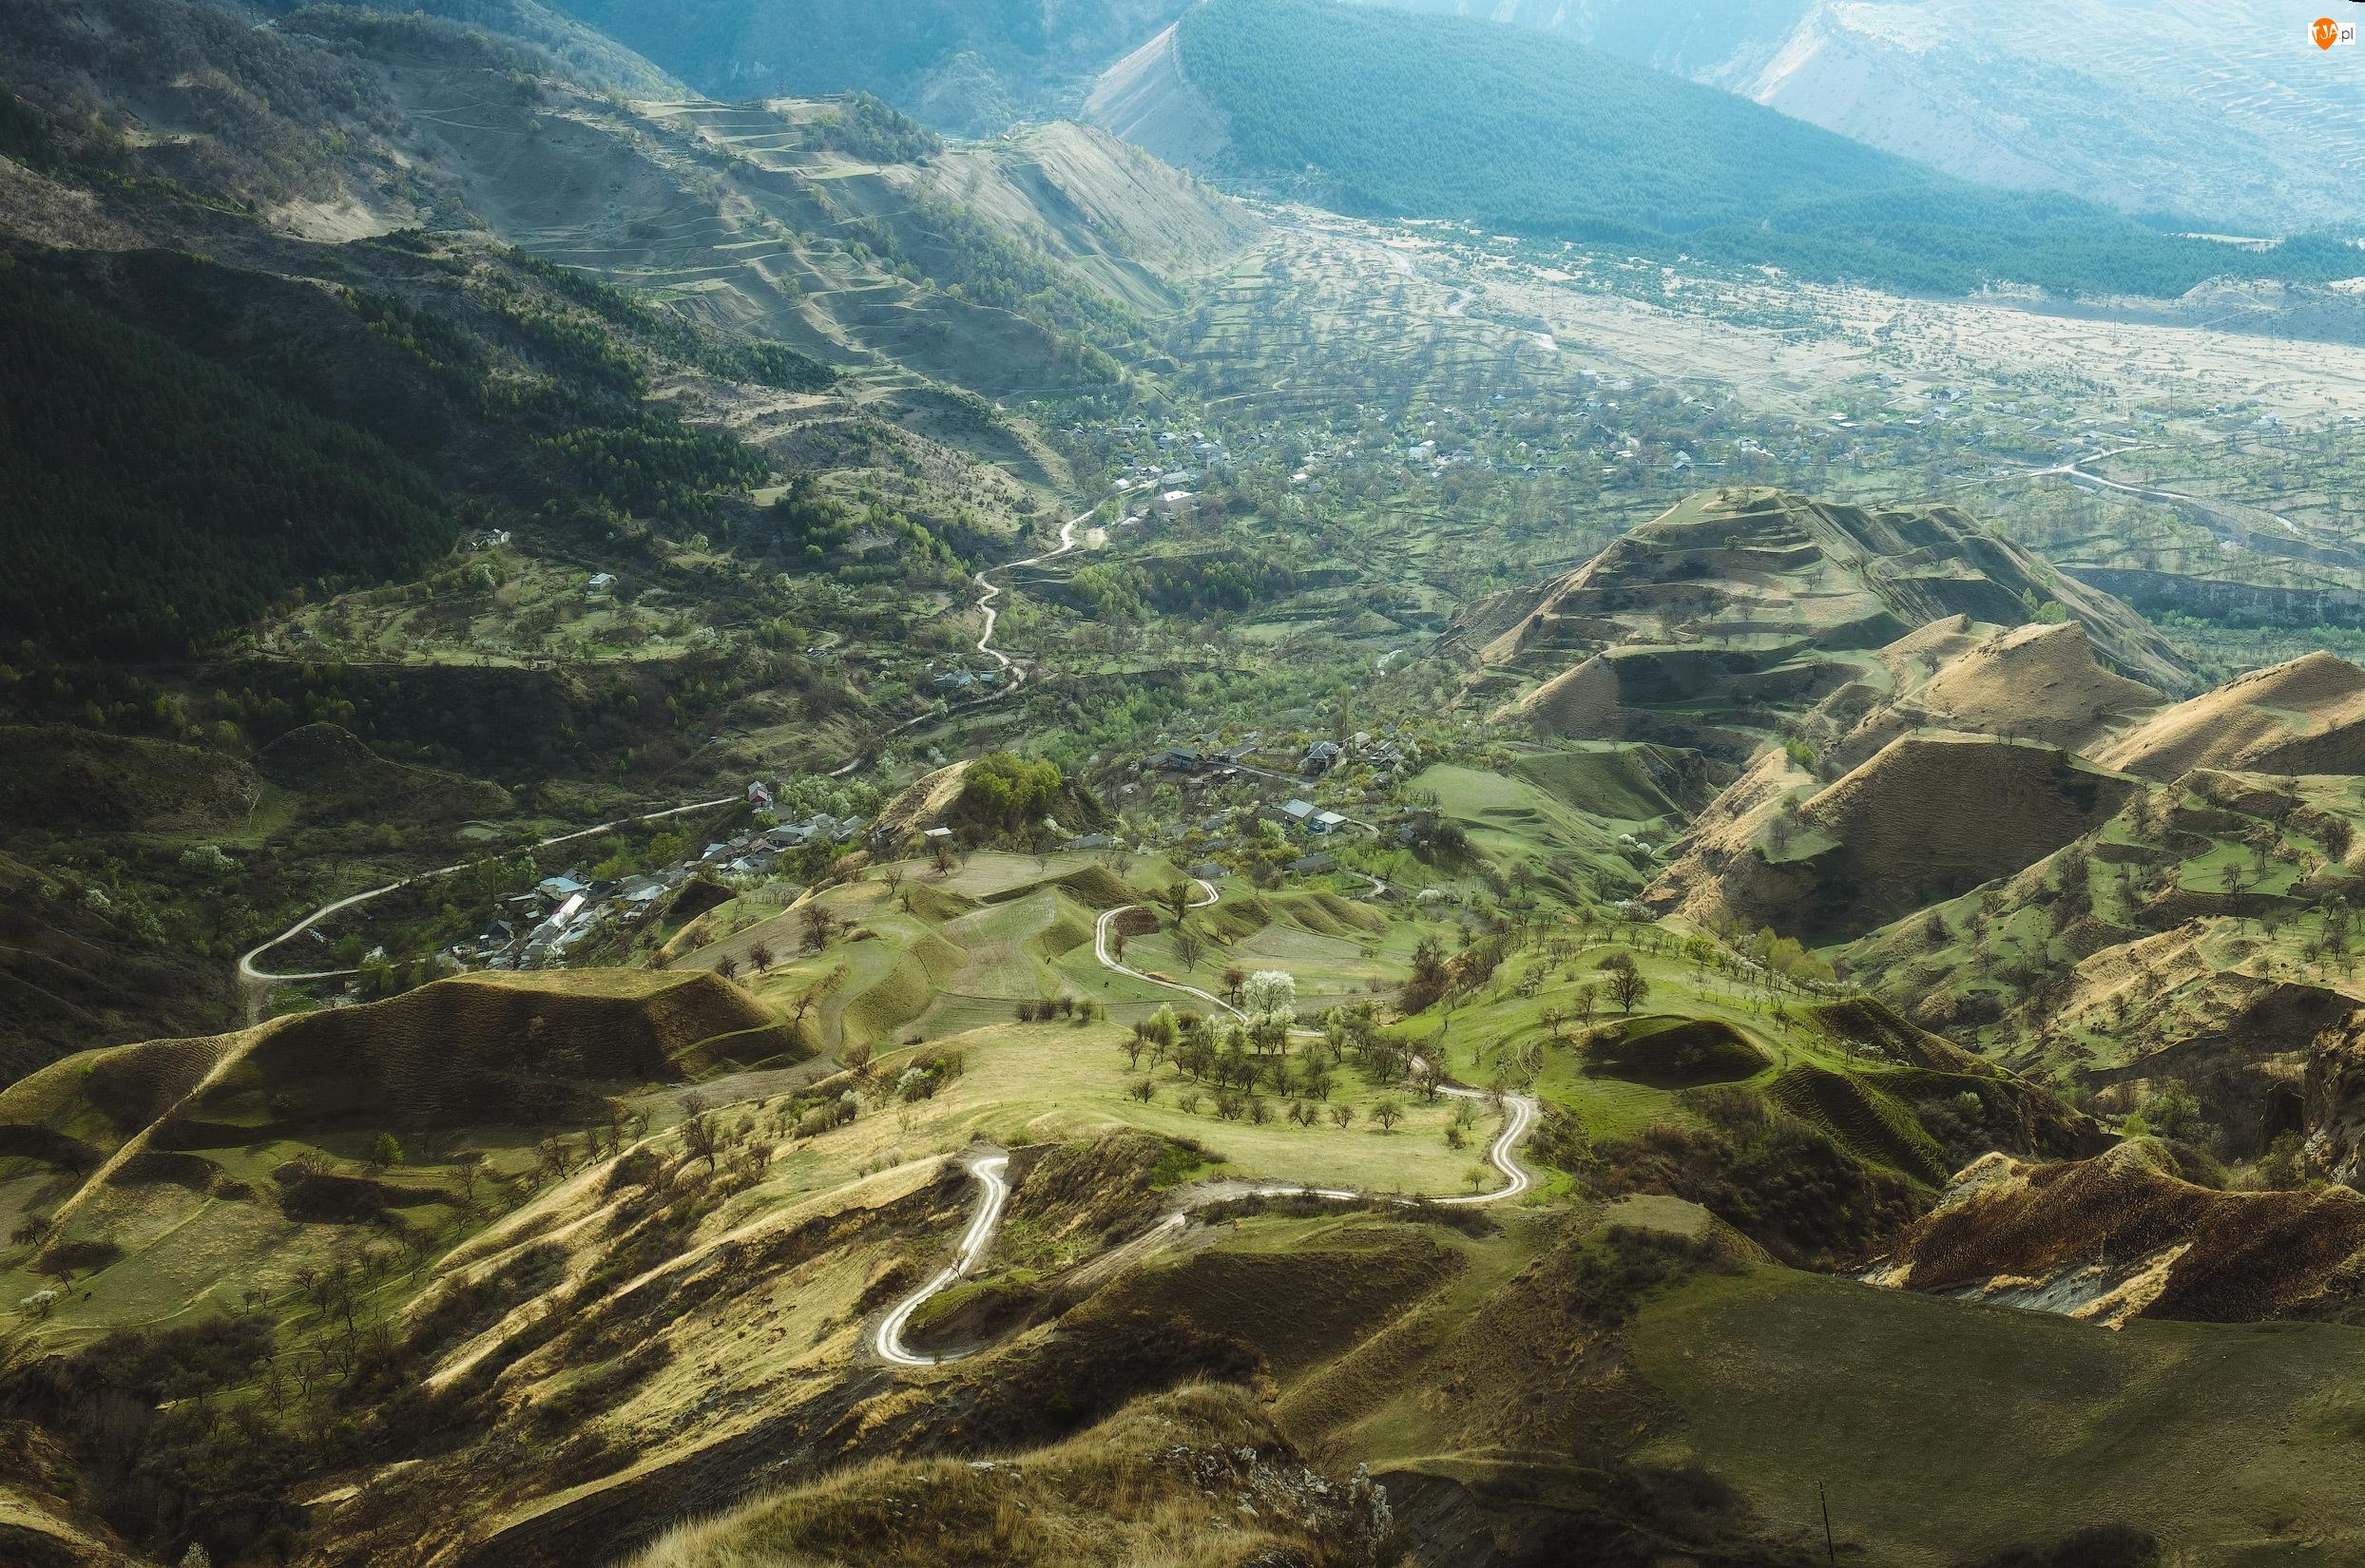 Rosja, Kaukaz, Republika Dagestanu, Wieś, Amishta, Wzgórza, Droga, Góry, Dolina